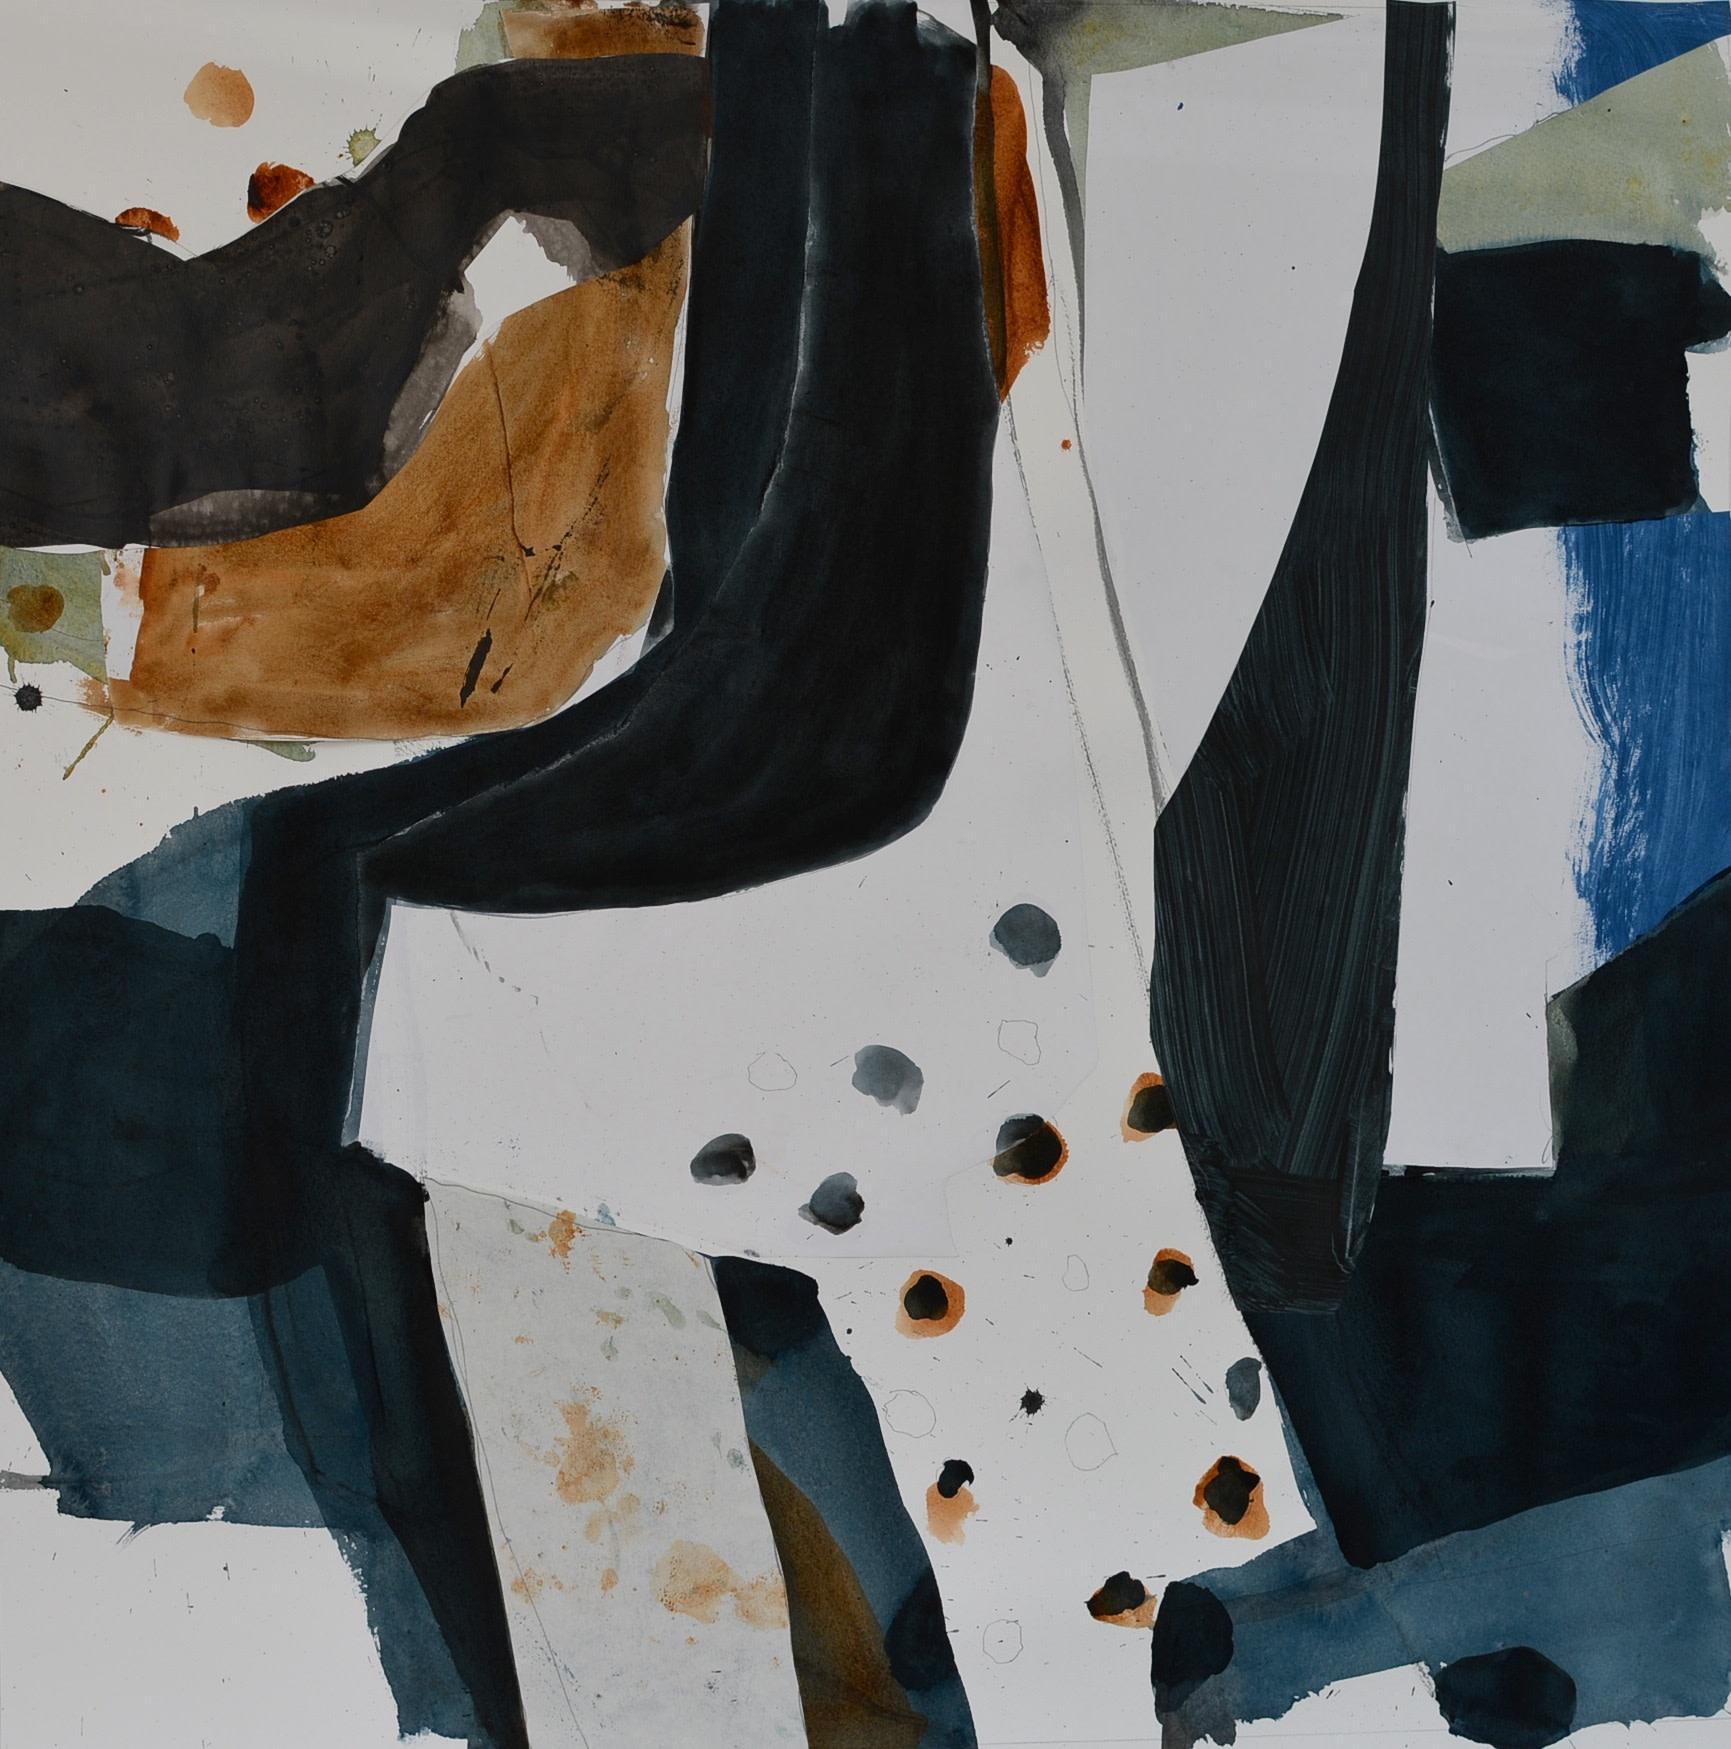 <span class=&#34;link fancybox-details-link&#34;><a href=&#34;/exhibitions/16/works/image_standalone418/&#34;>View Detail Page</a></span><p>James Hunter, <em>Cliff Quarry</em>, &#163;1800</p>